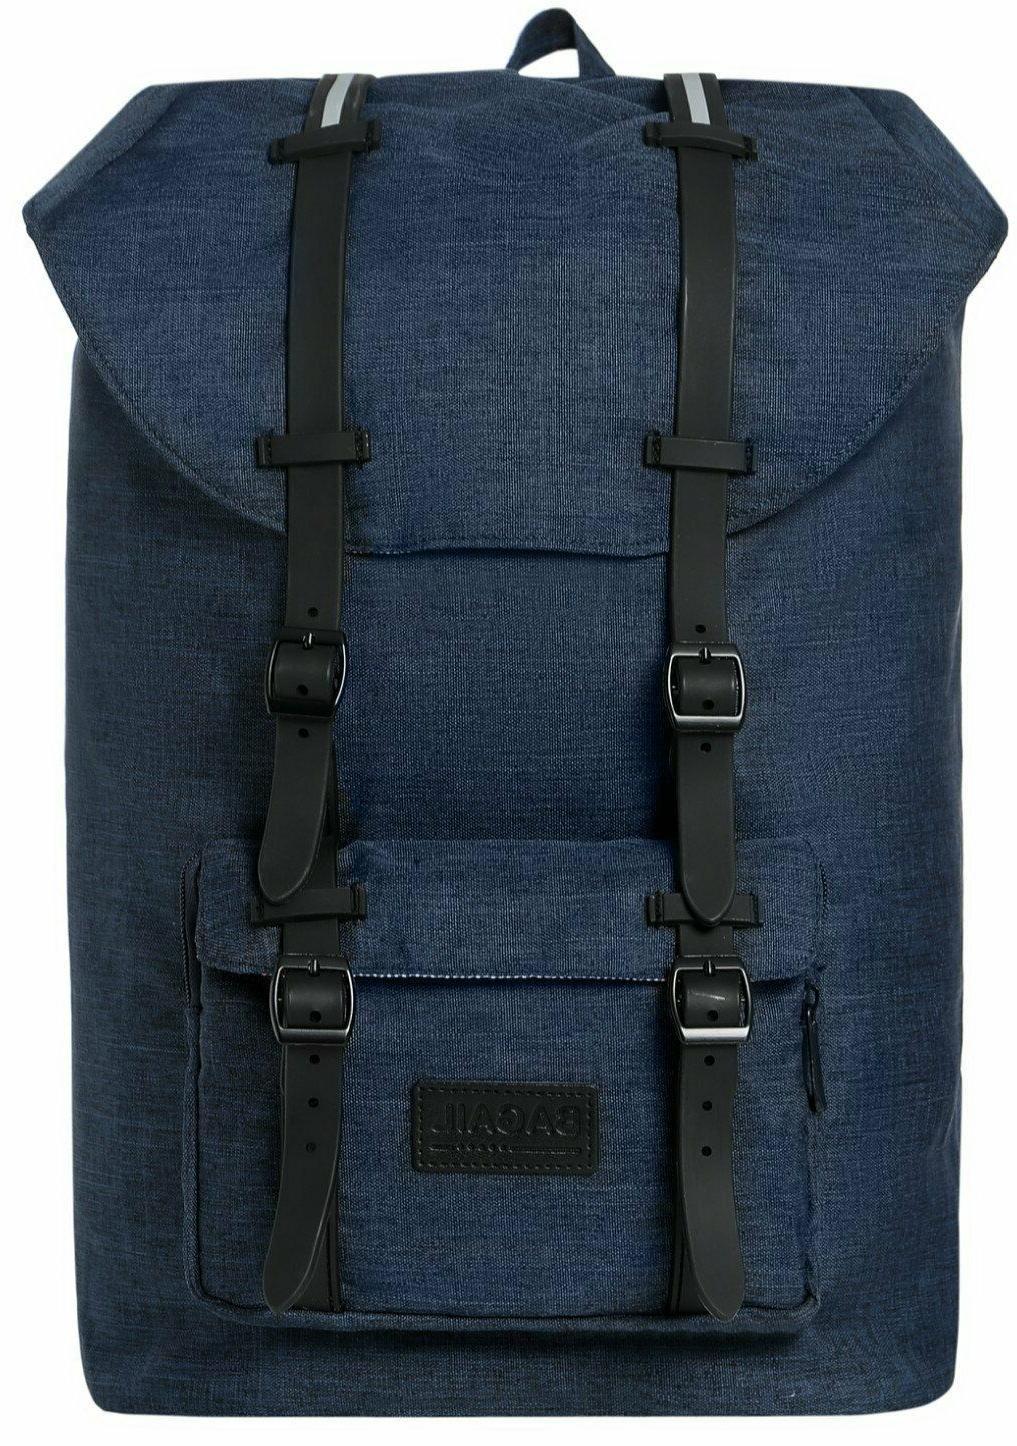 NAVY Folding Travel BAG or Choice